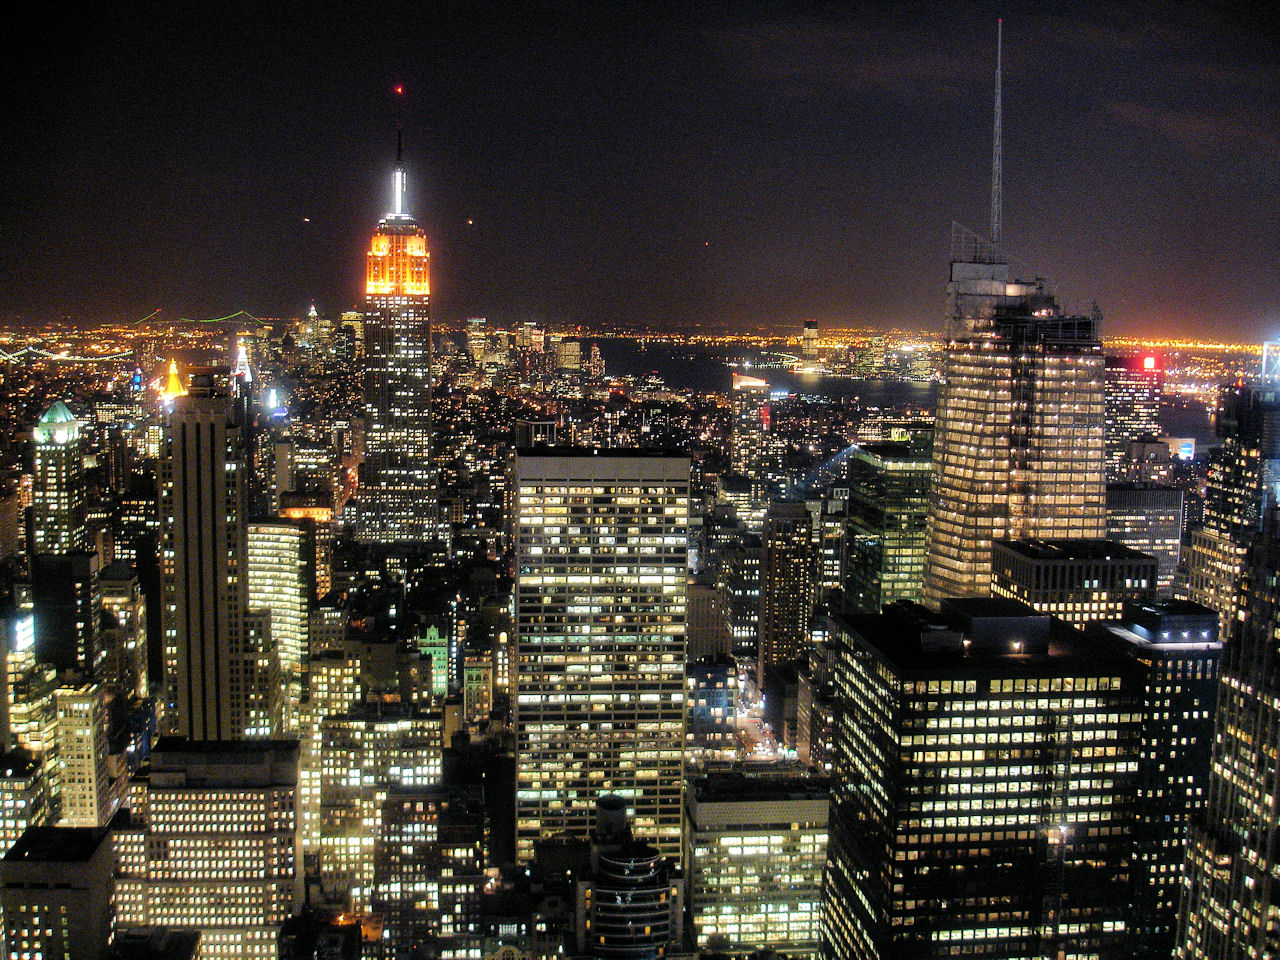 New York City Lights wallpaper 1280x960 21716 1280x960